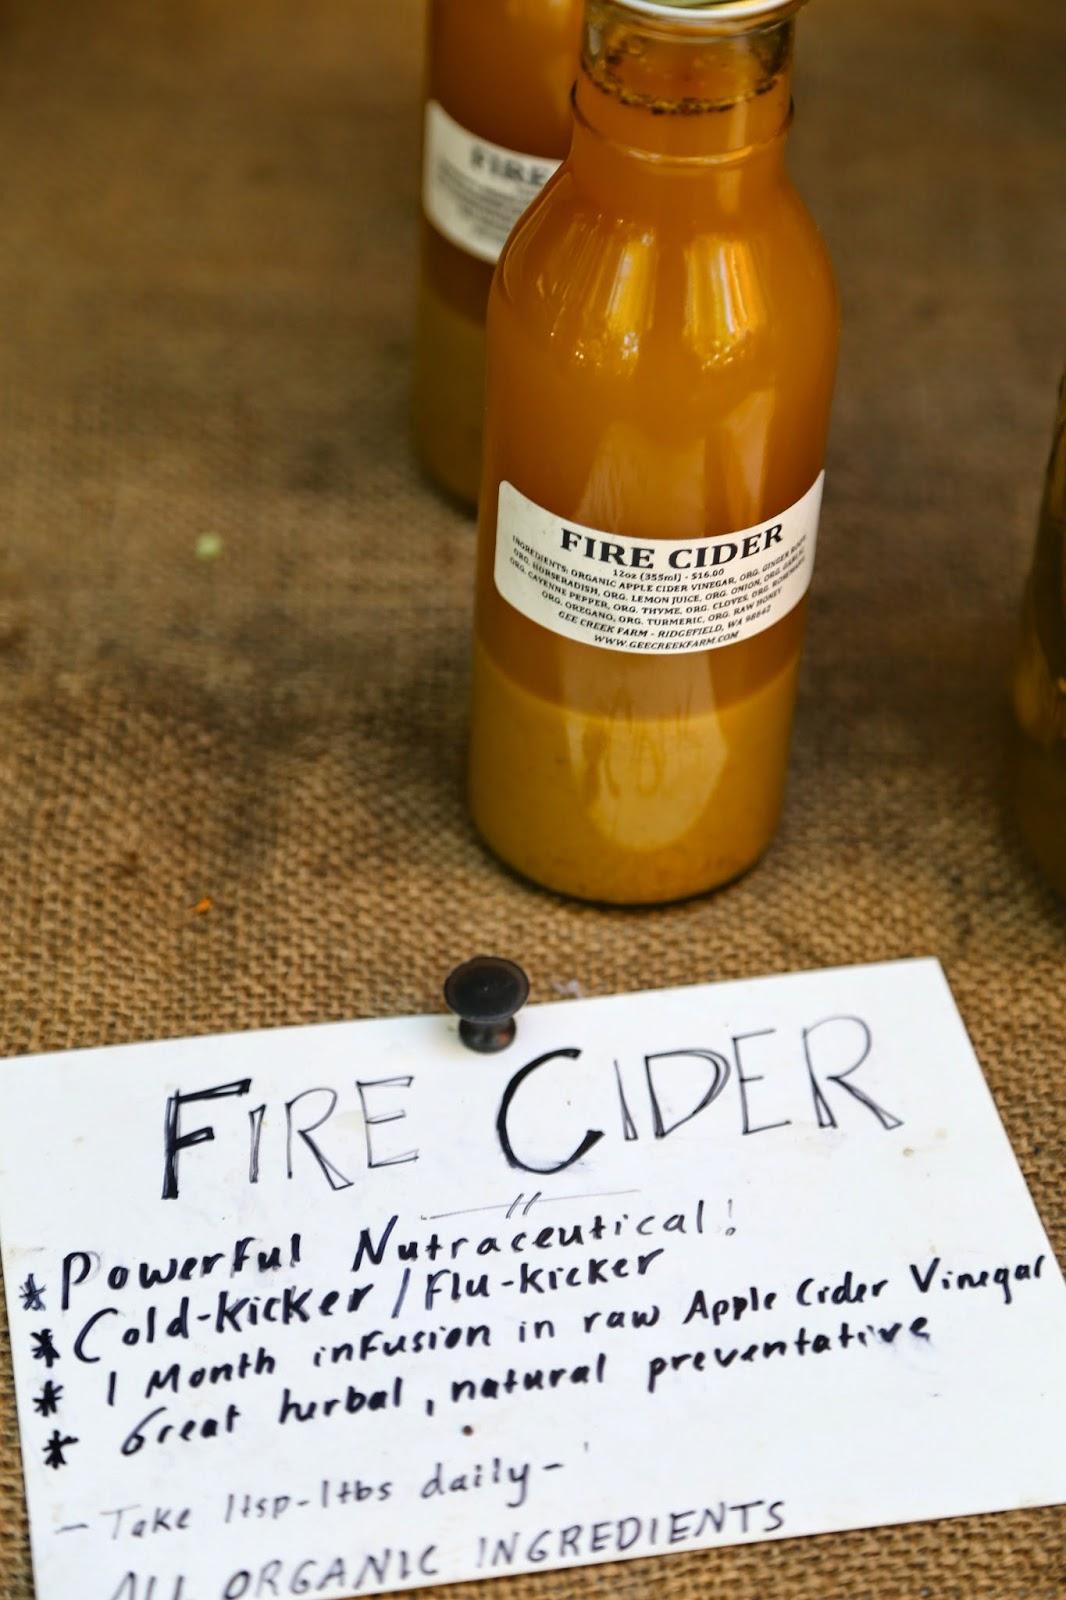 Artisanal fire cider, Portland farmers market